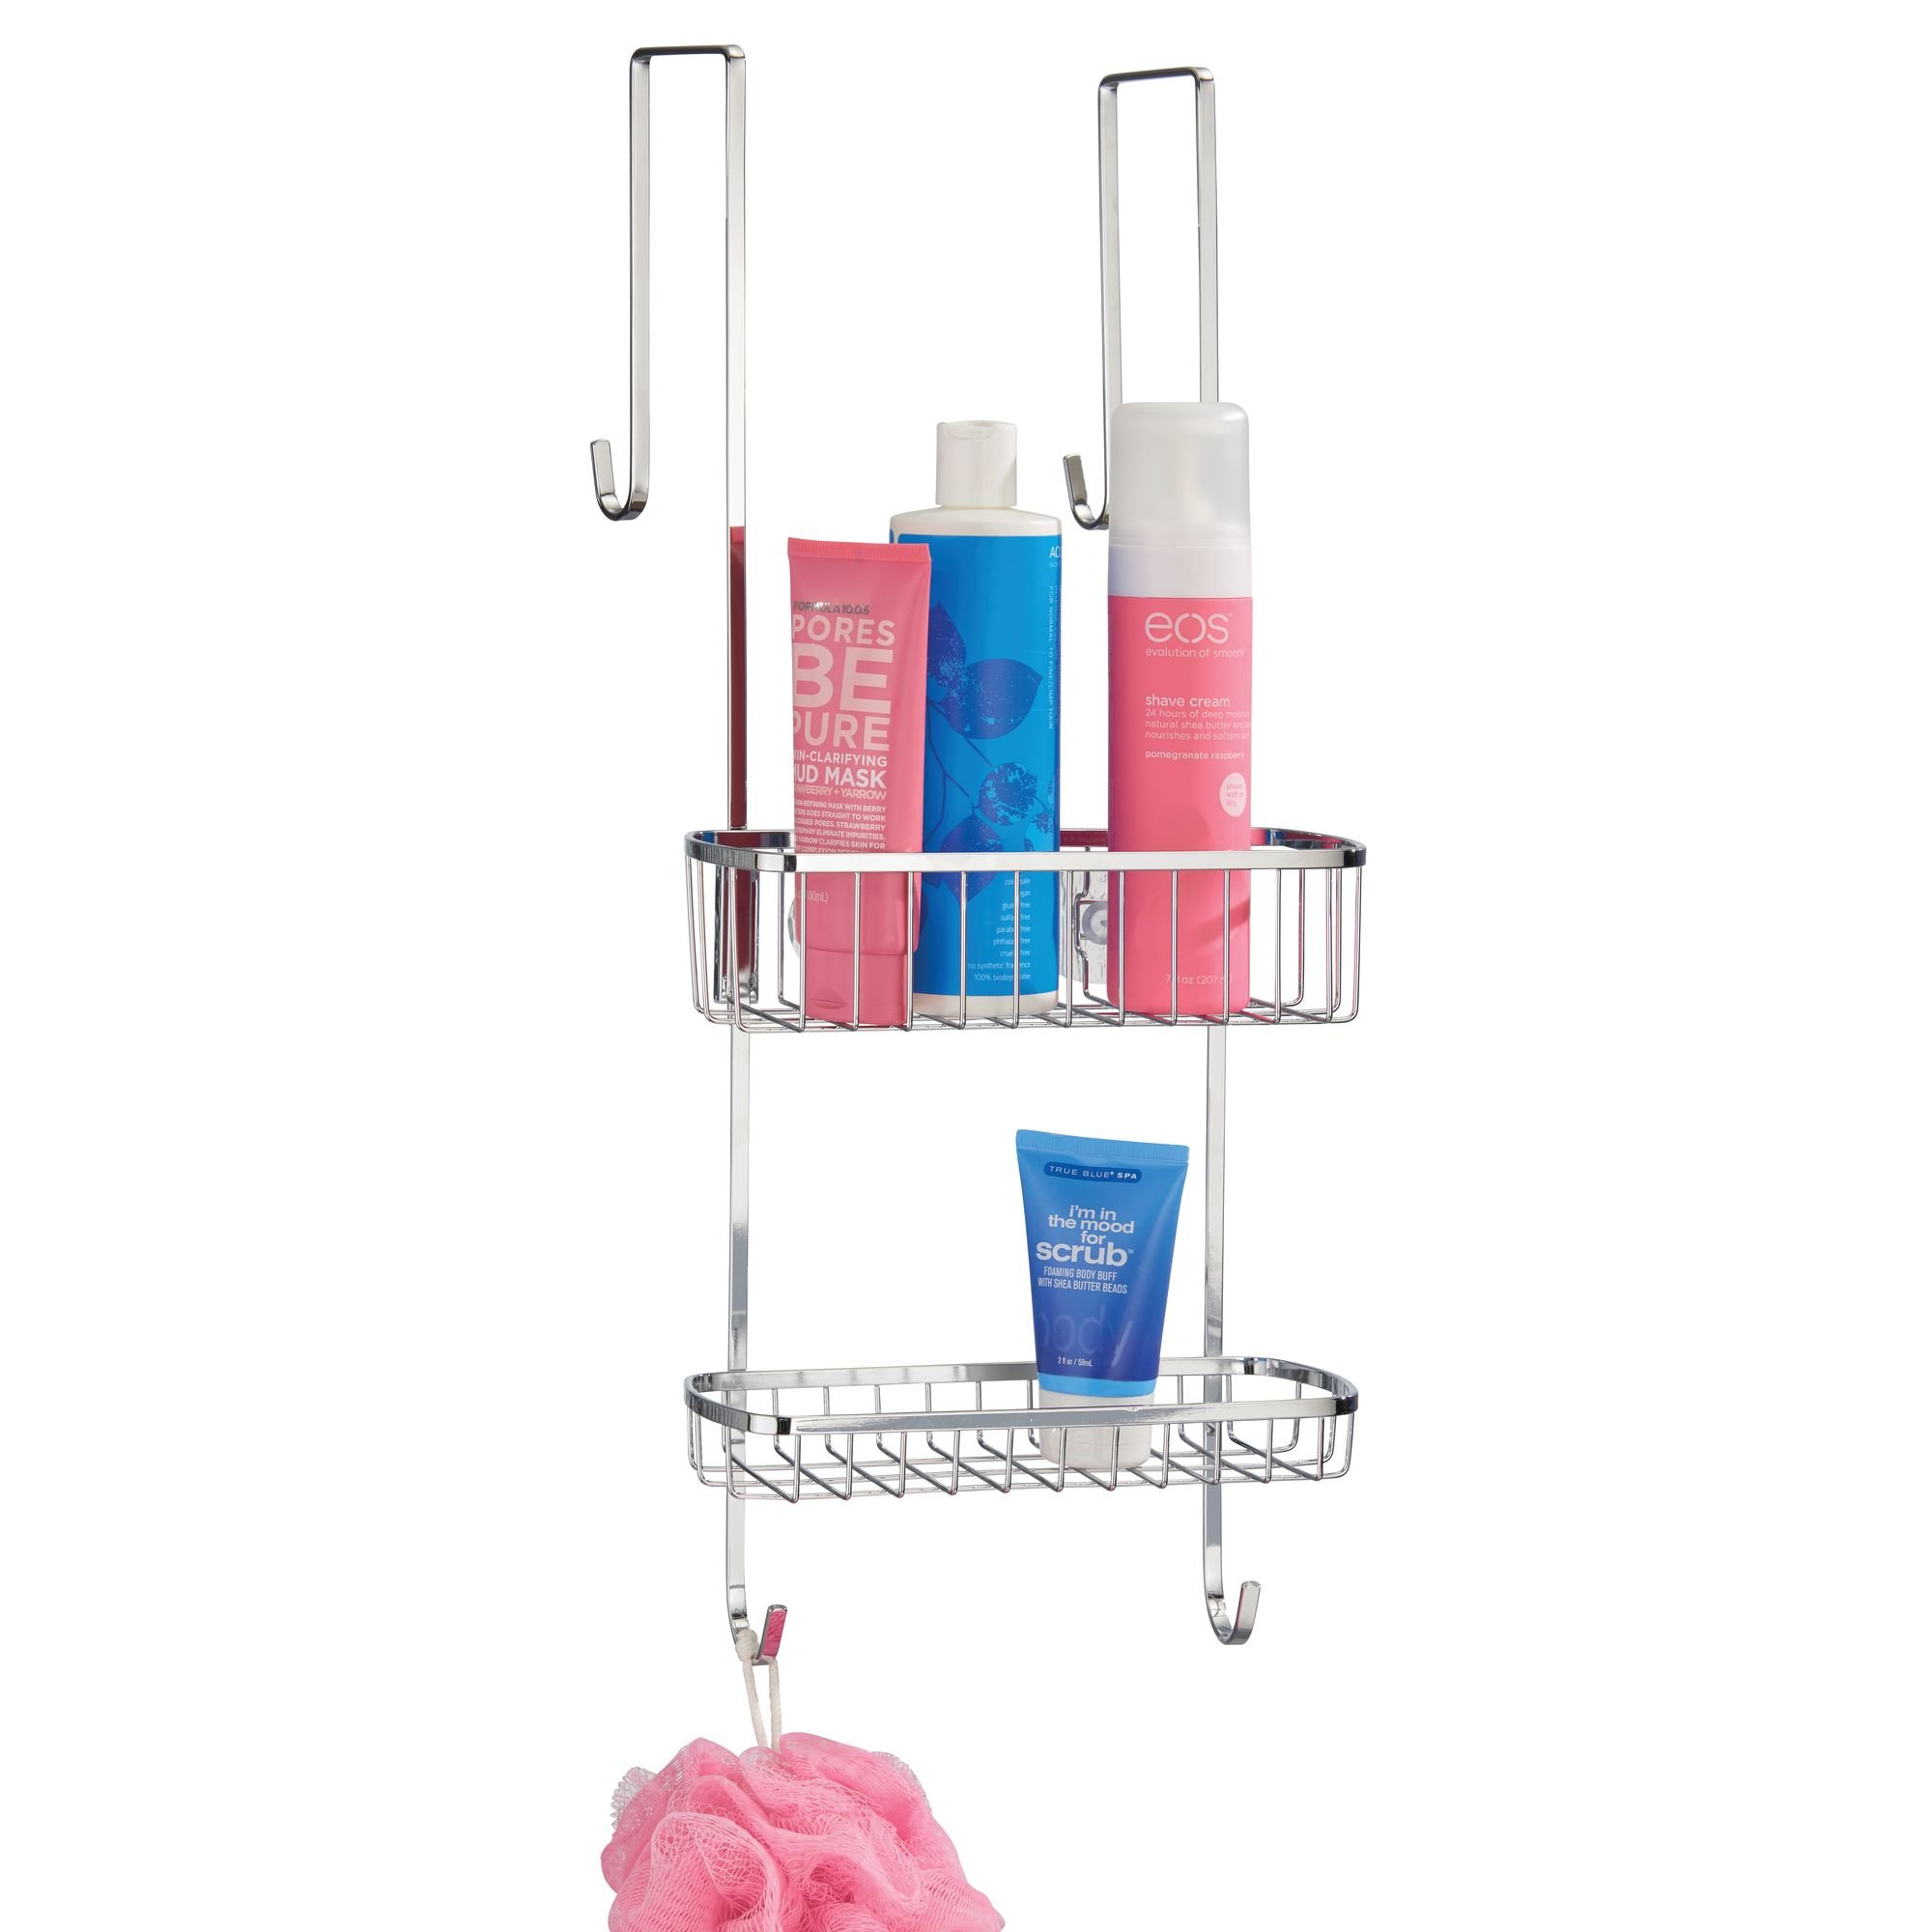 mDesign Estantería de ducha para colgar sobre la mampara – Práctico  colgador para ducha de acero 99790e76d599